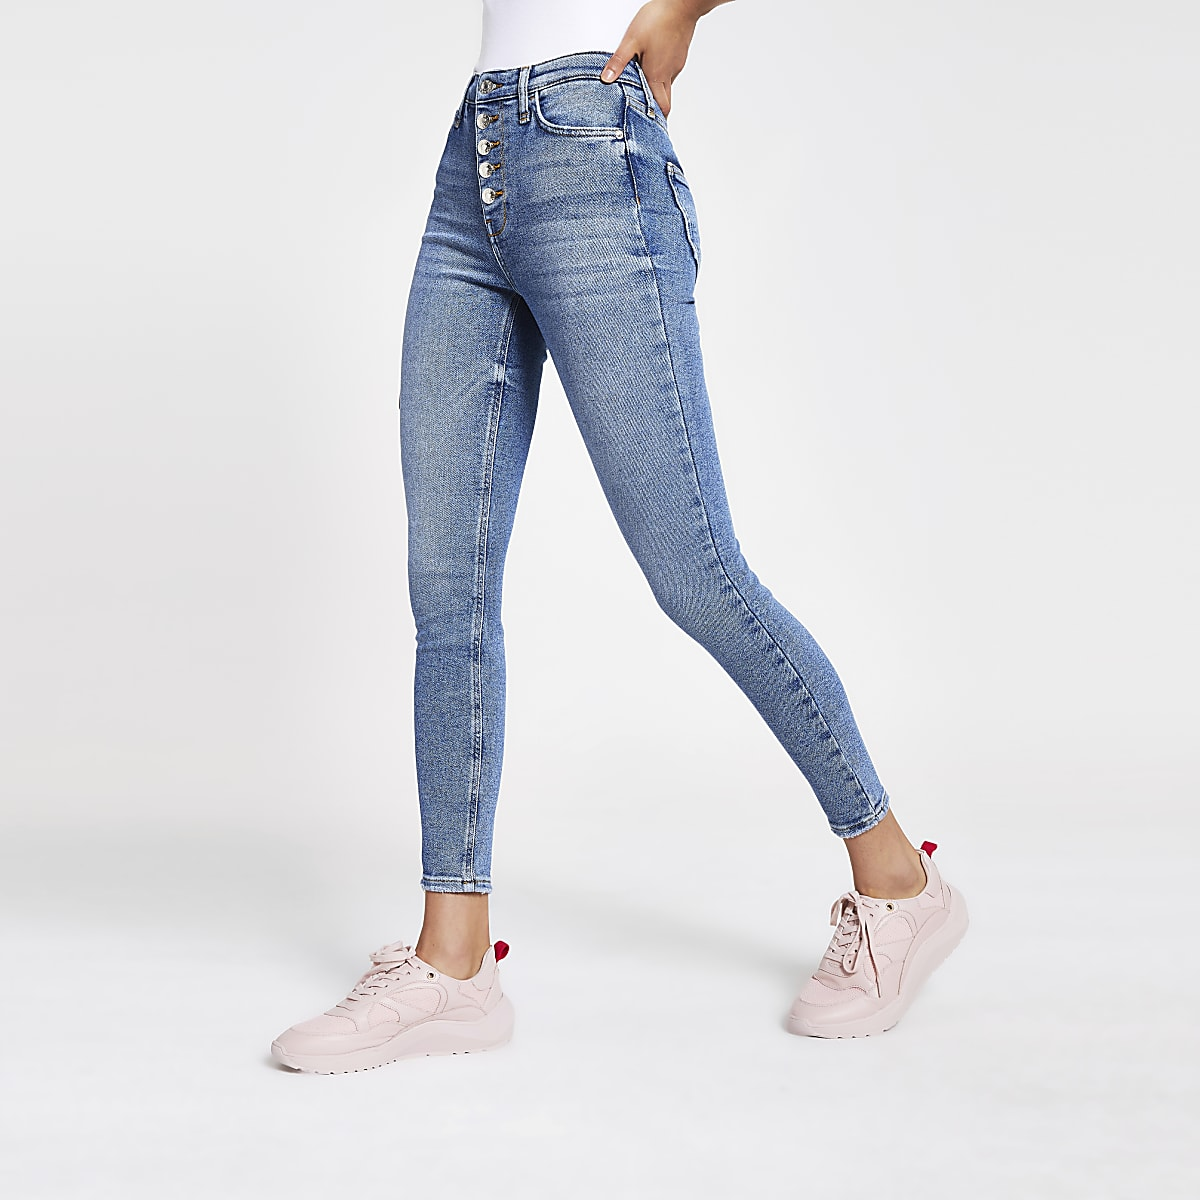 .Mid blue Hailey high rise jeans